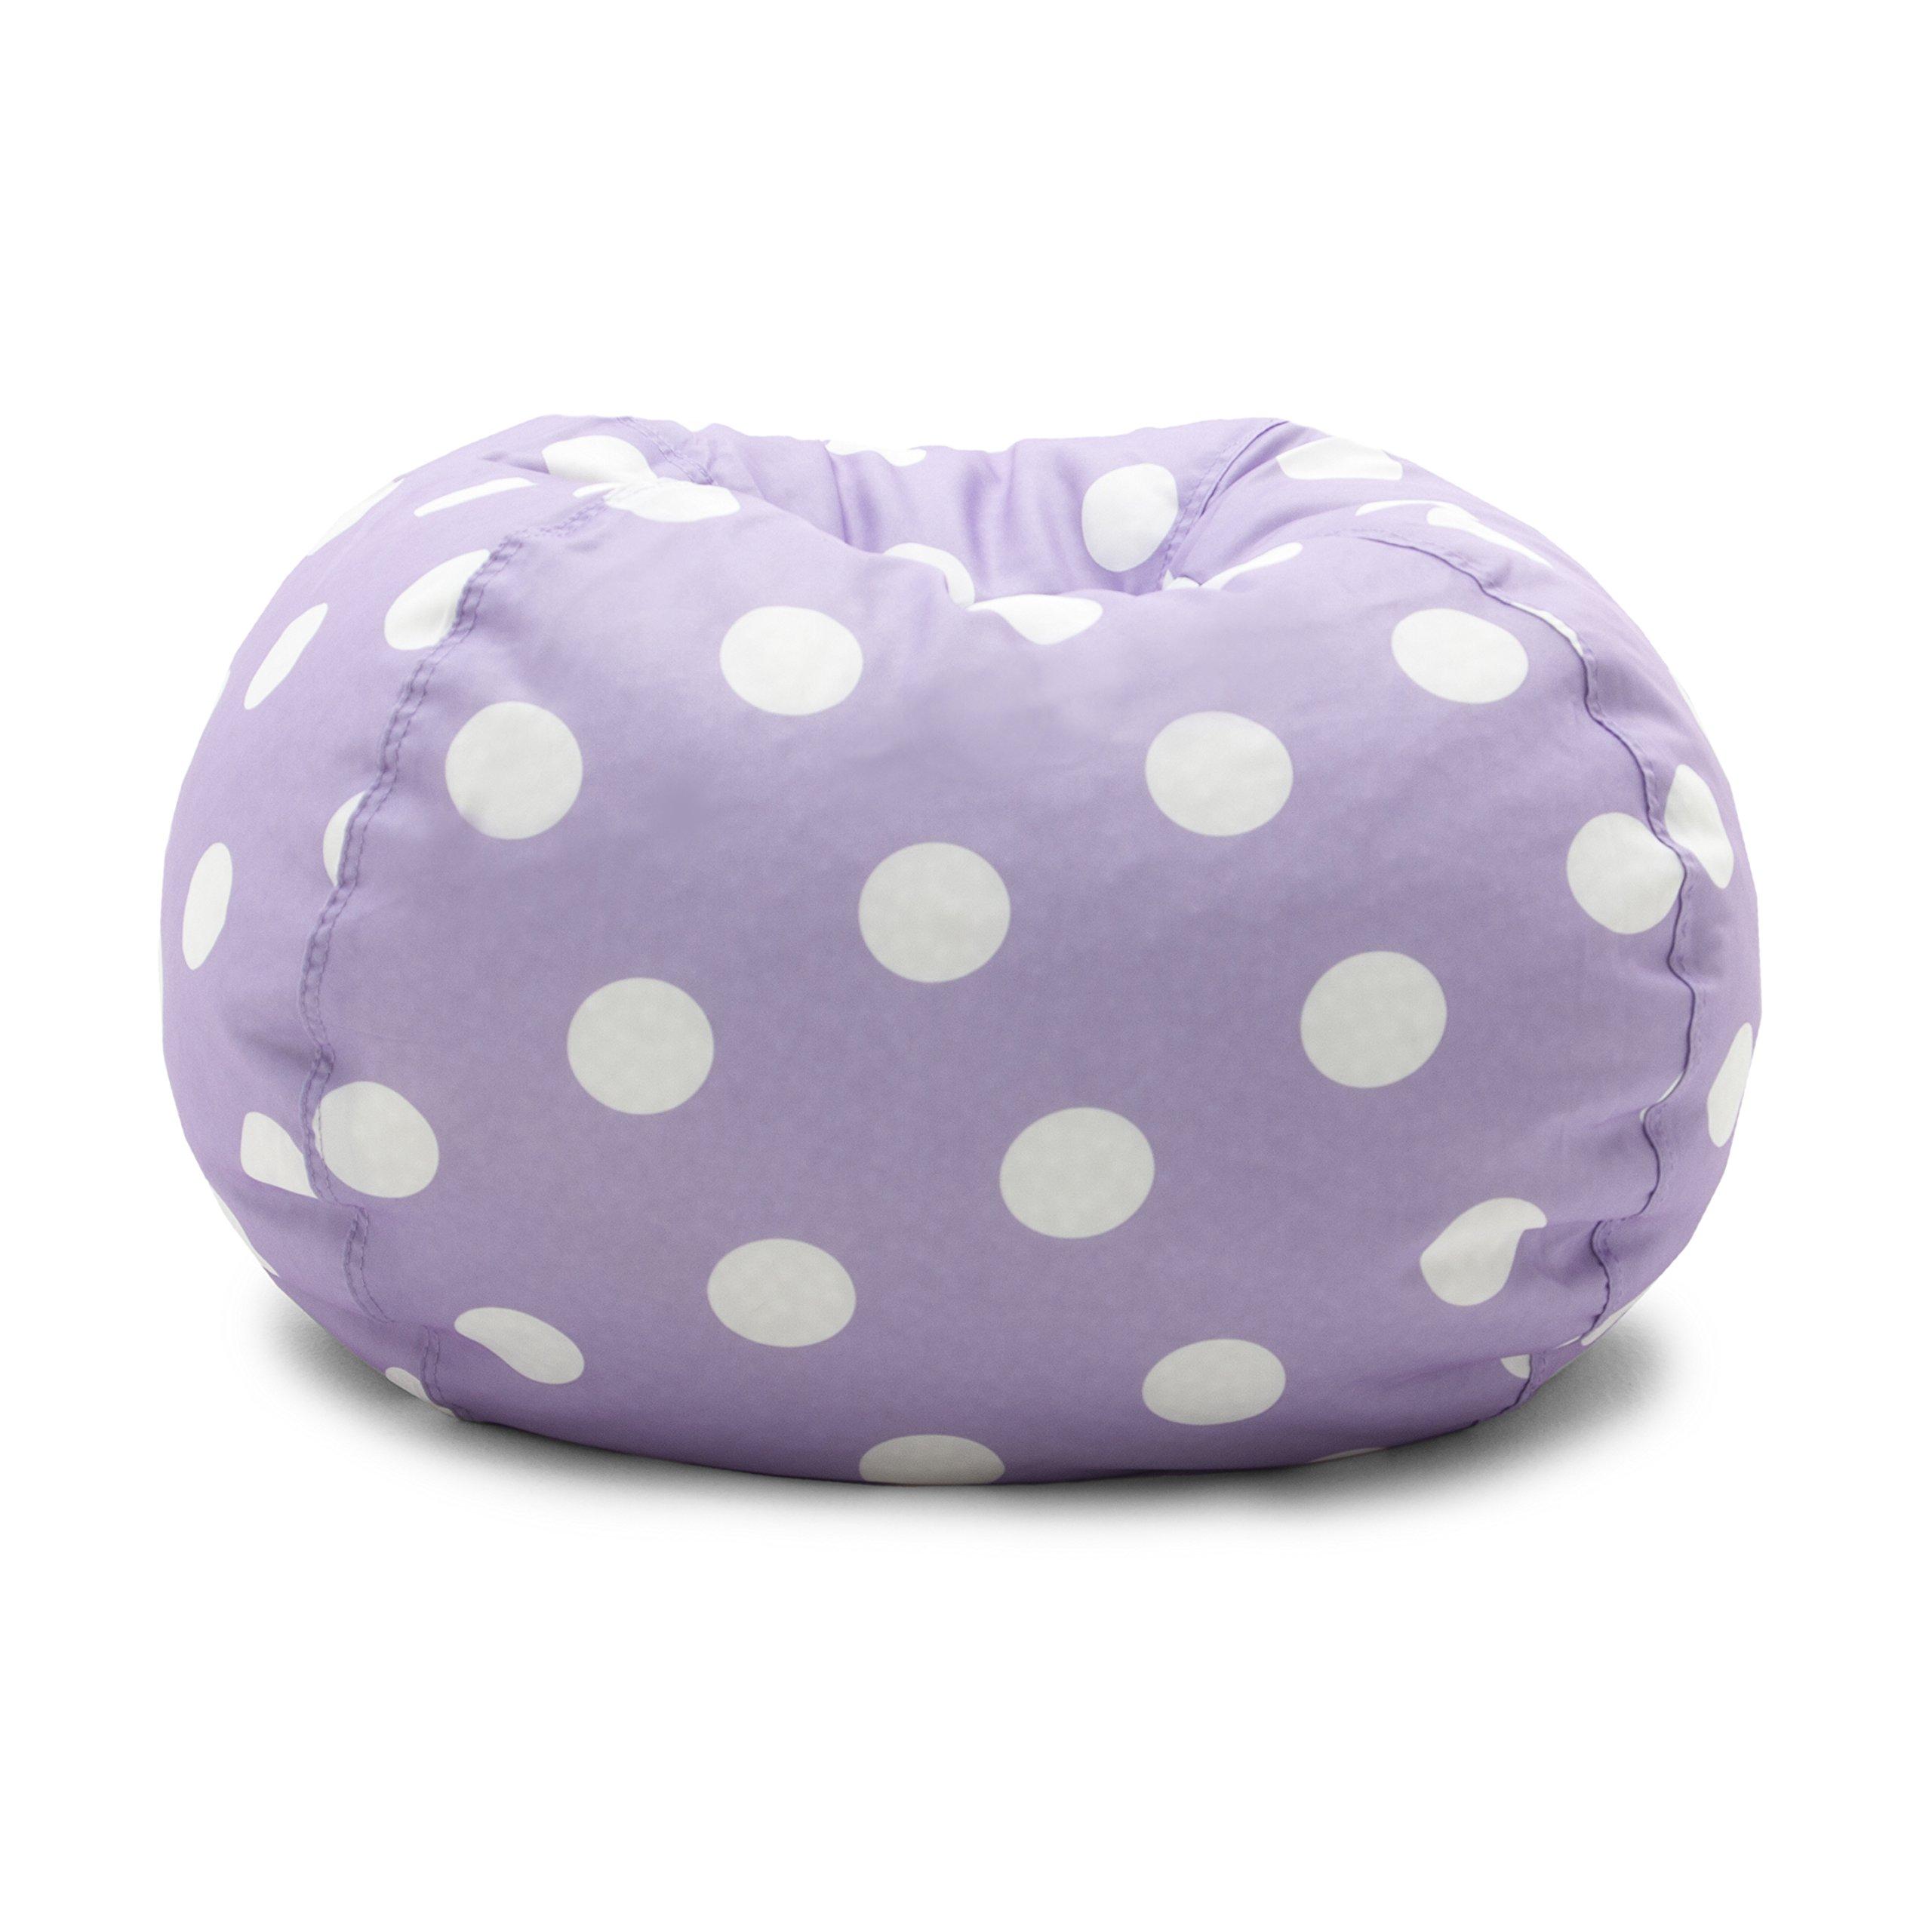 Big Joe 0630252 Lavender Polka Dot Classic Bean Bag Chair, Lavendar with White by Big Joe